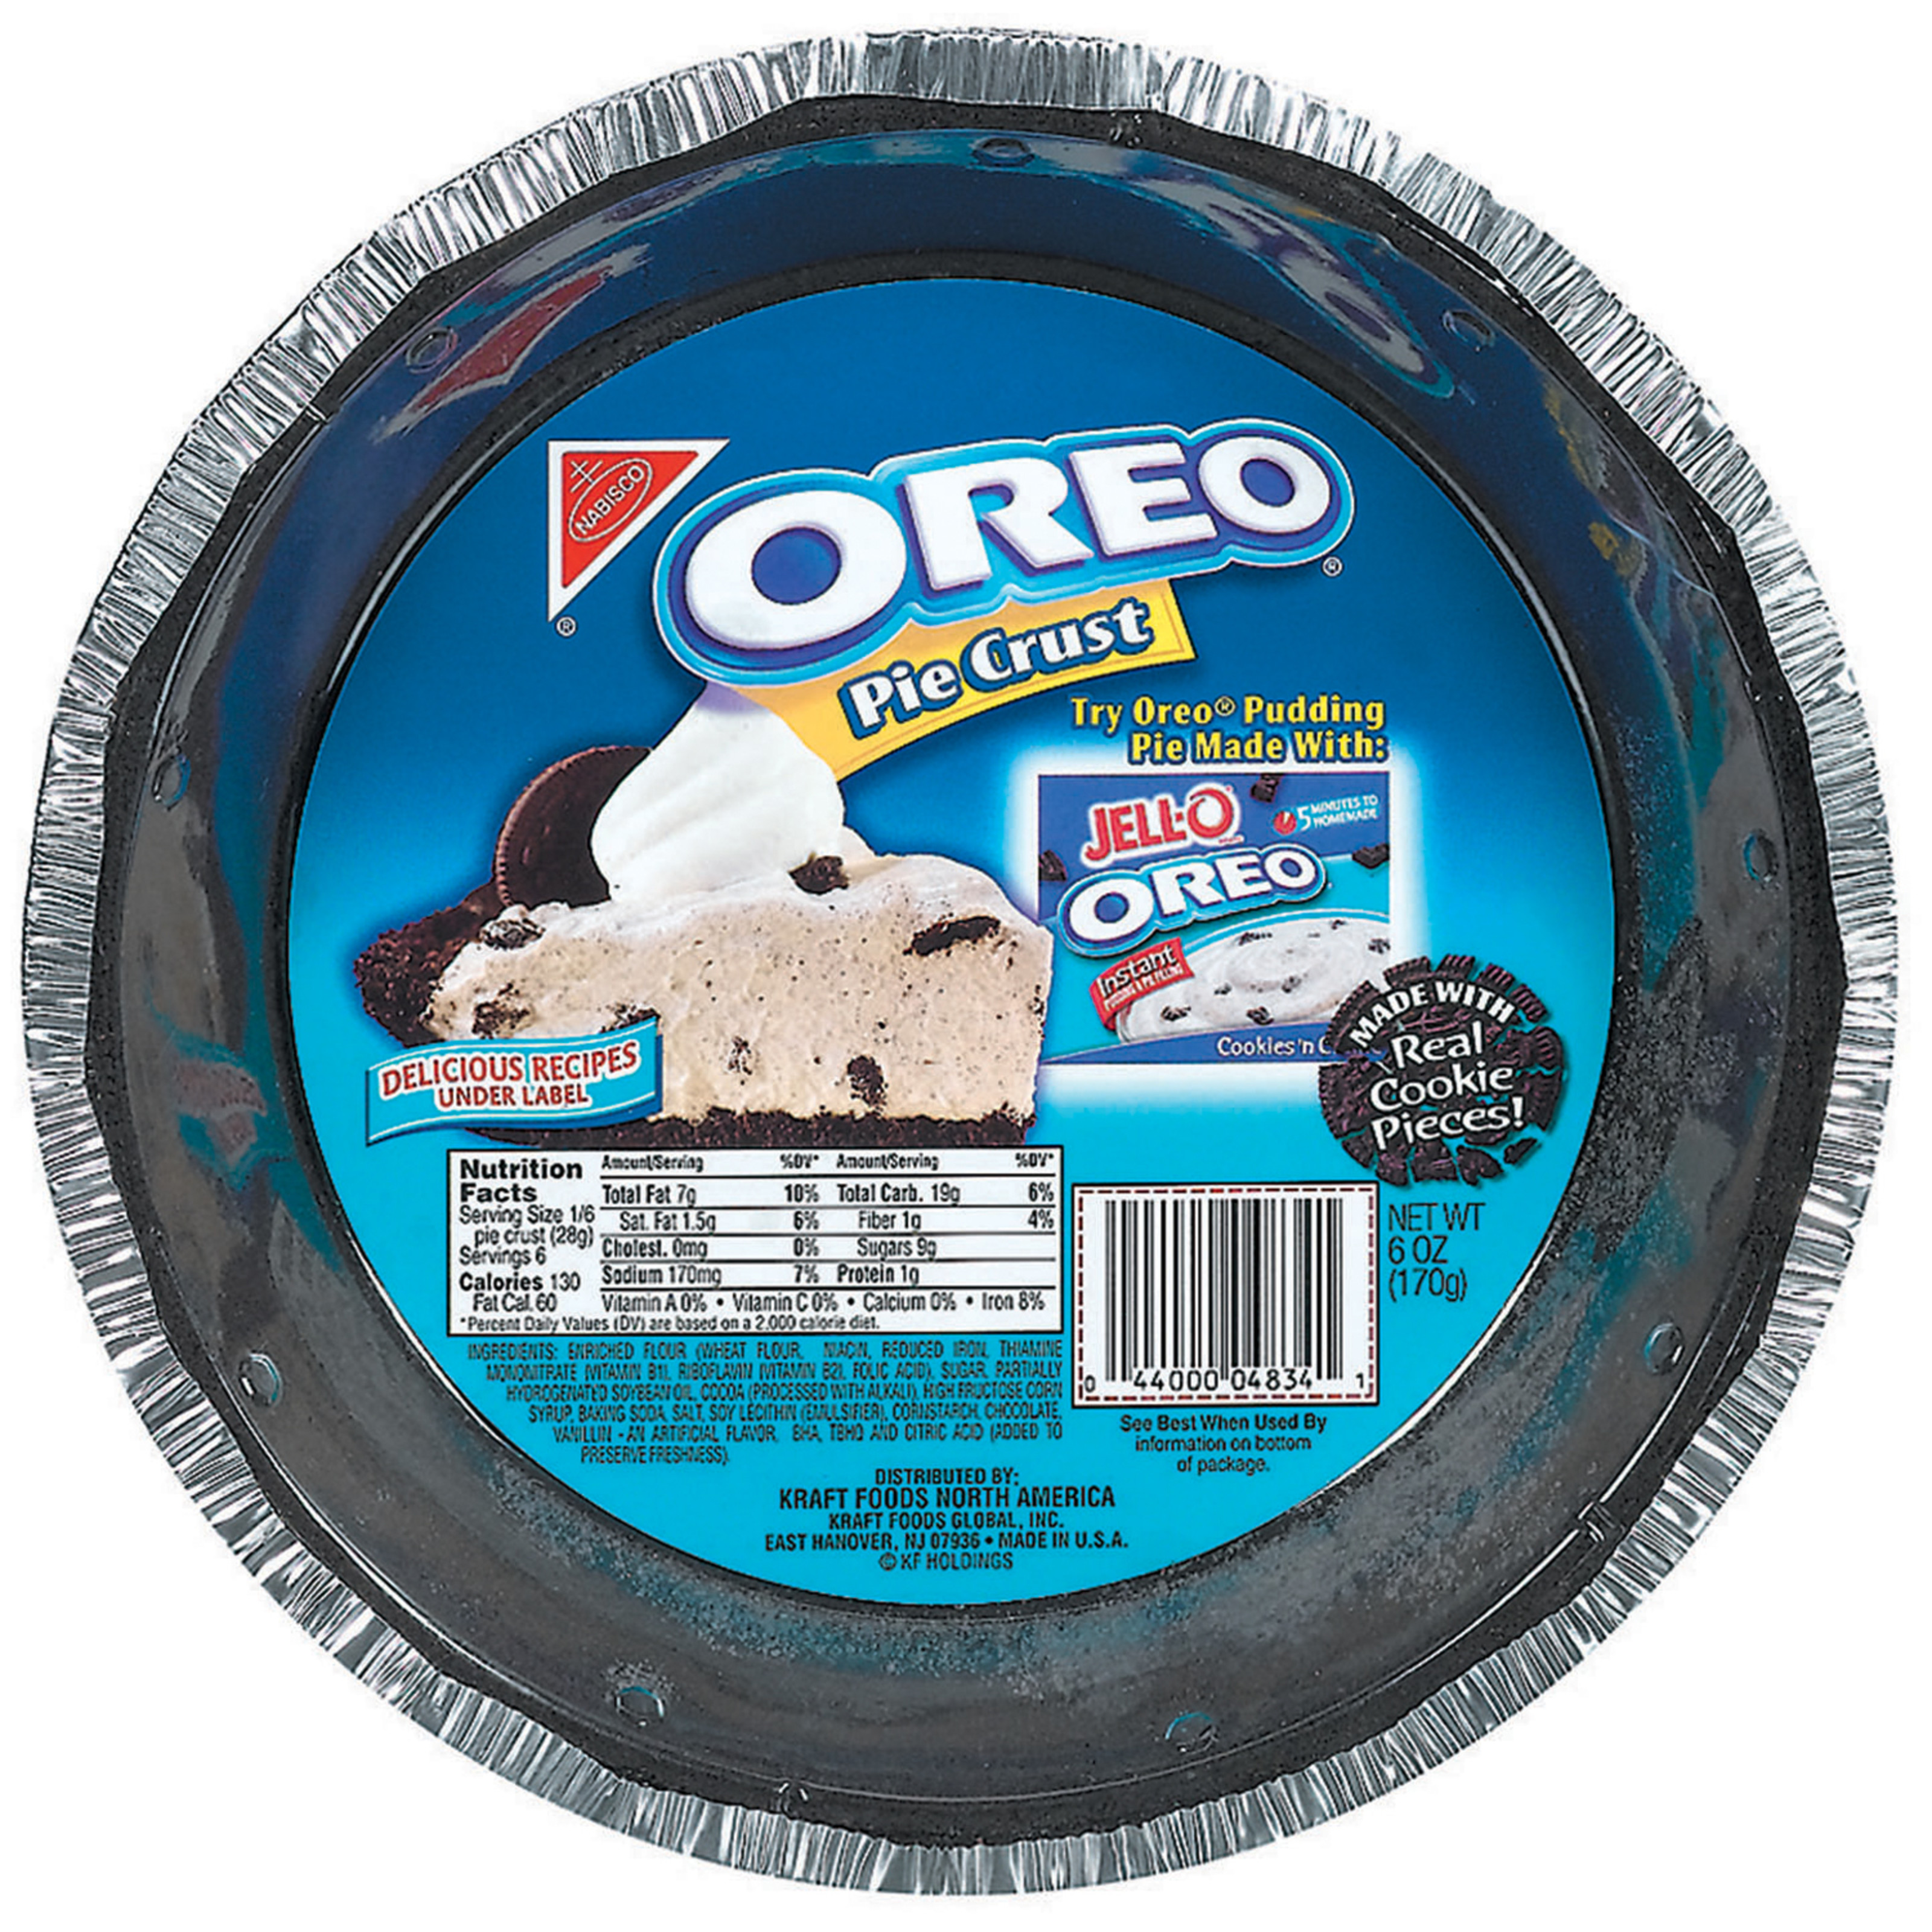 OREO Pie Crust, Ready to Bake, 12 Count   Walmart.com